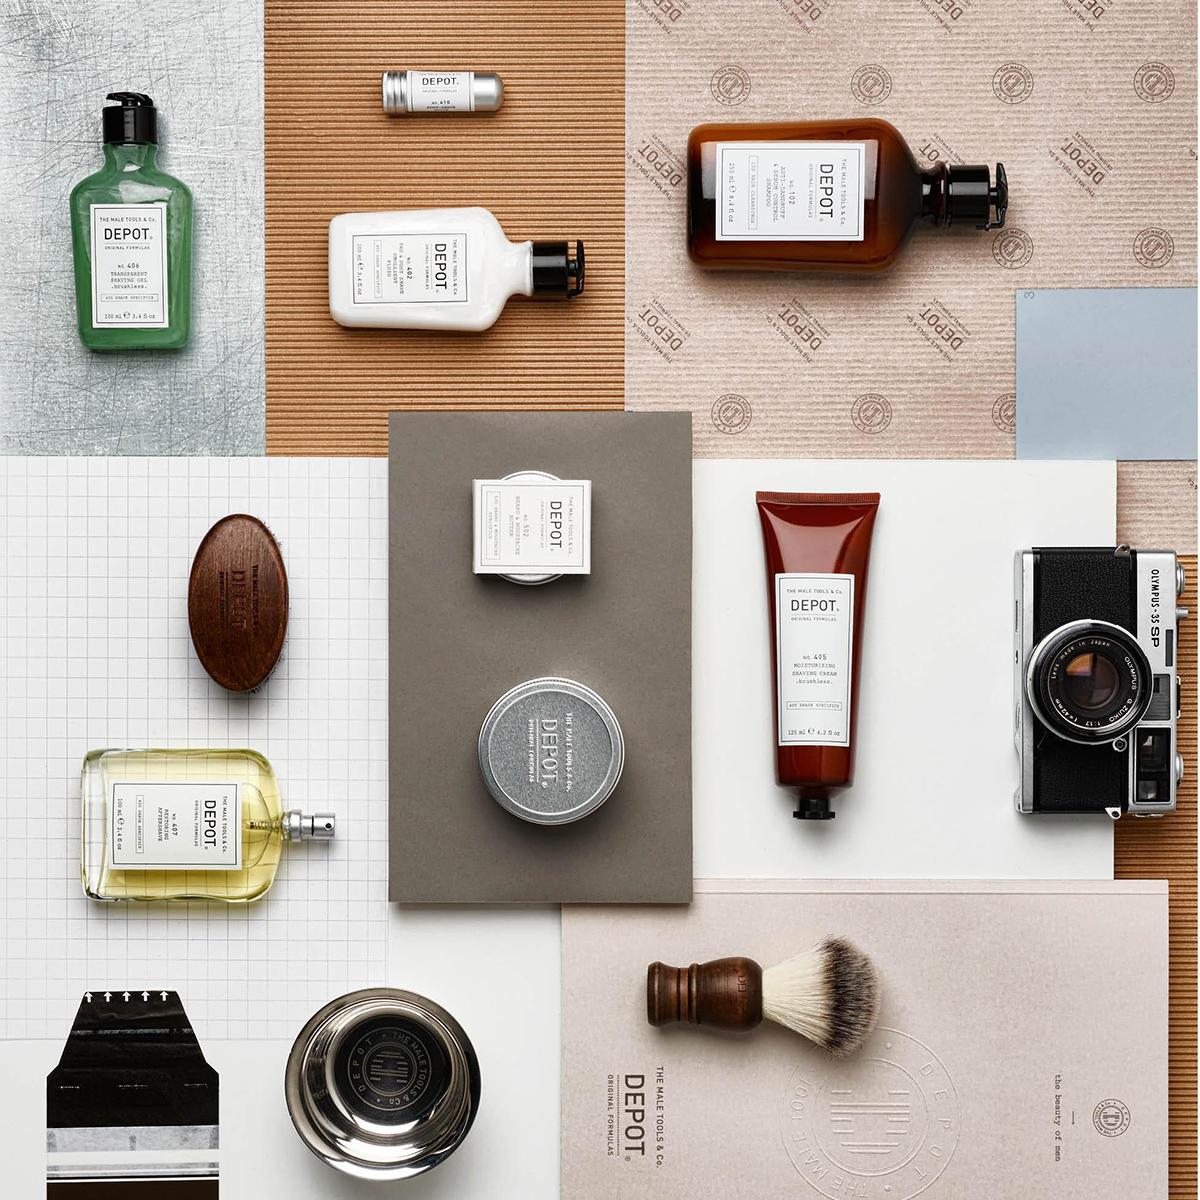 Depot Produkte